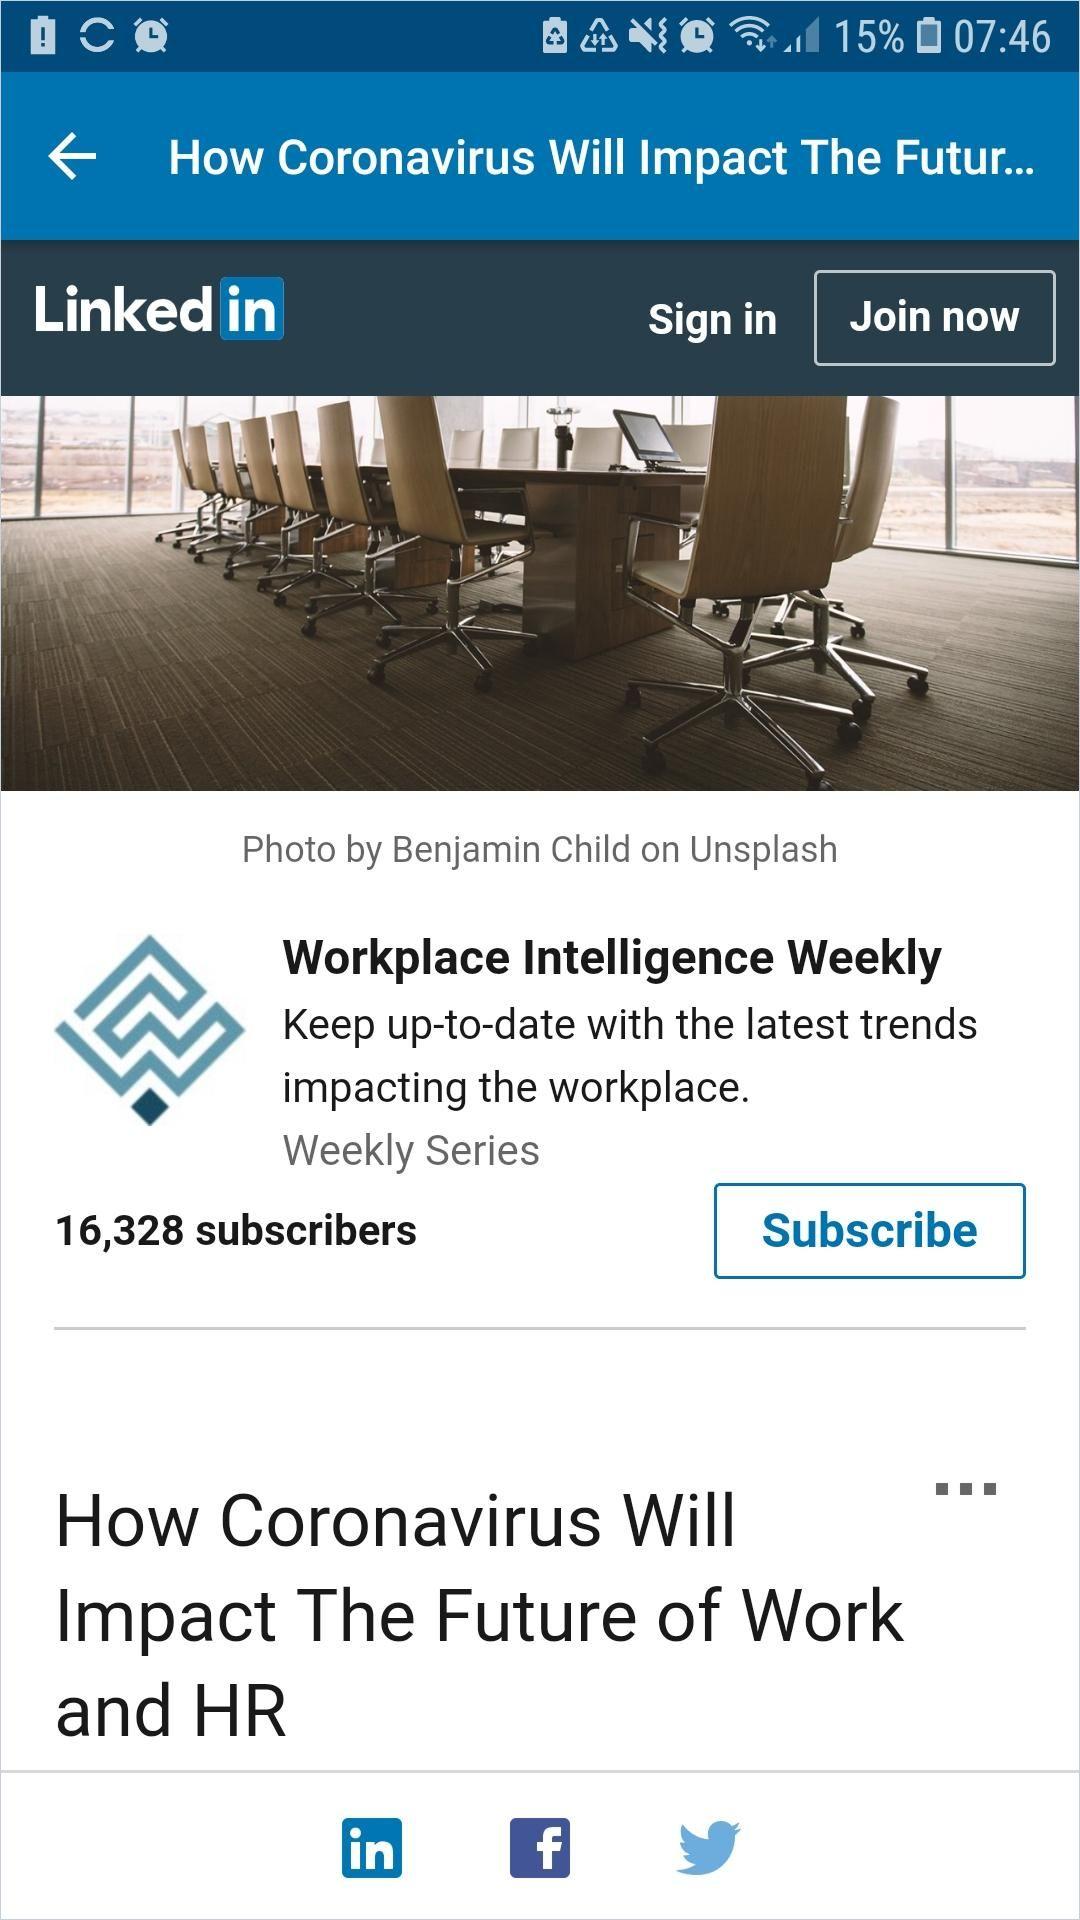 Image of: How Coronavirus Will Impact the Future of Work and HR